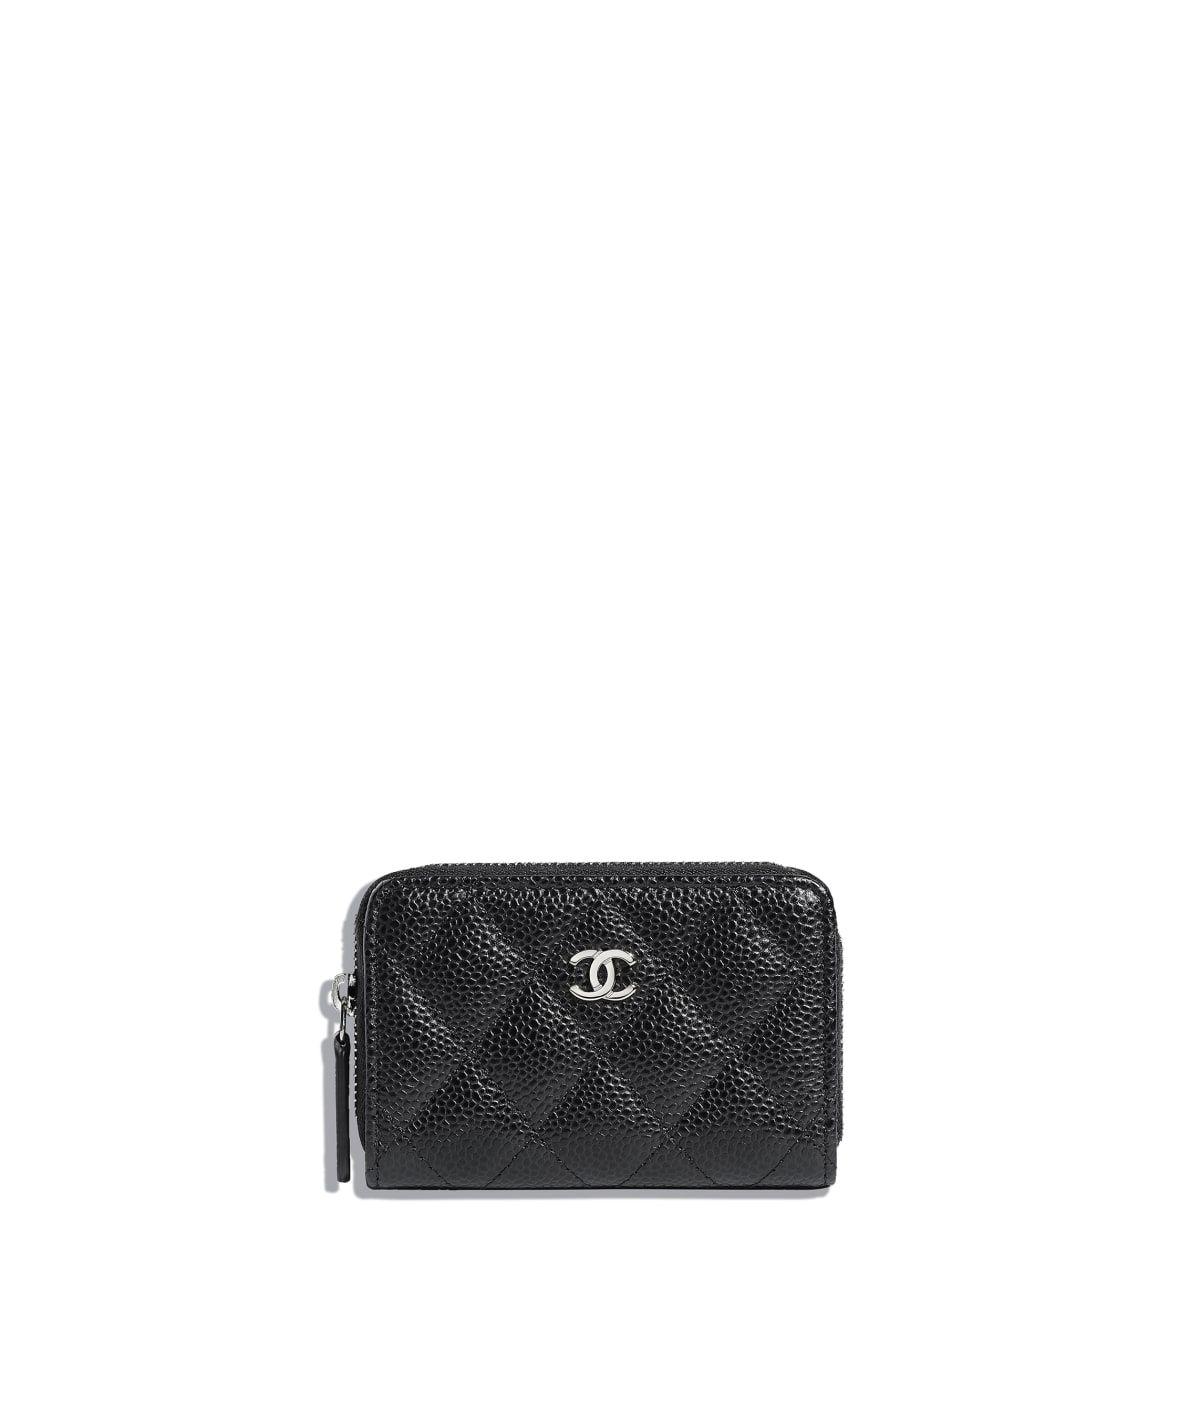 Petite Maroquinerie Chanel Mode De La Collection Classics Porte